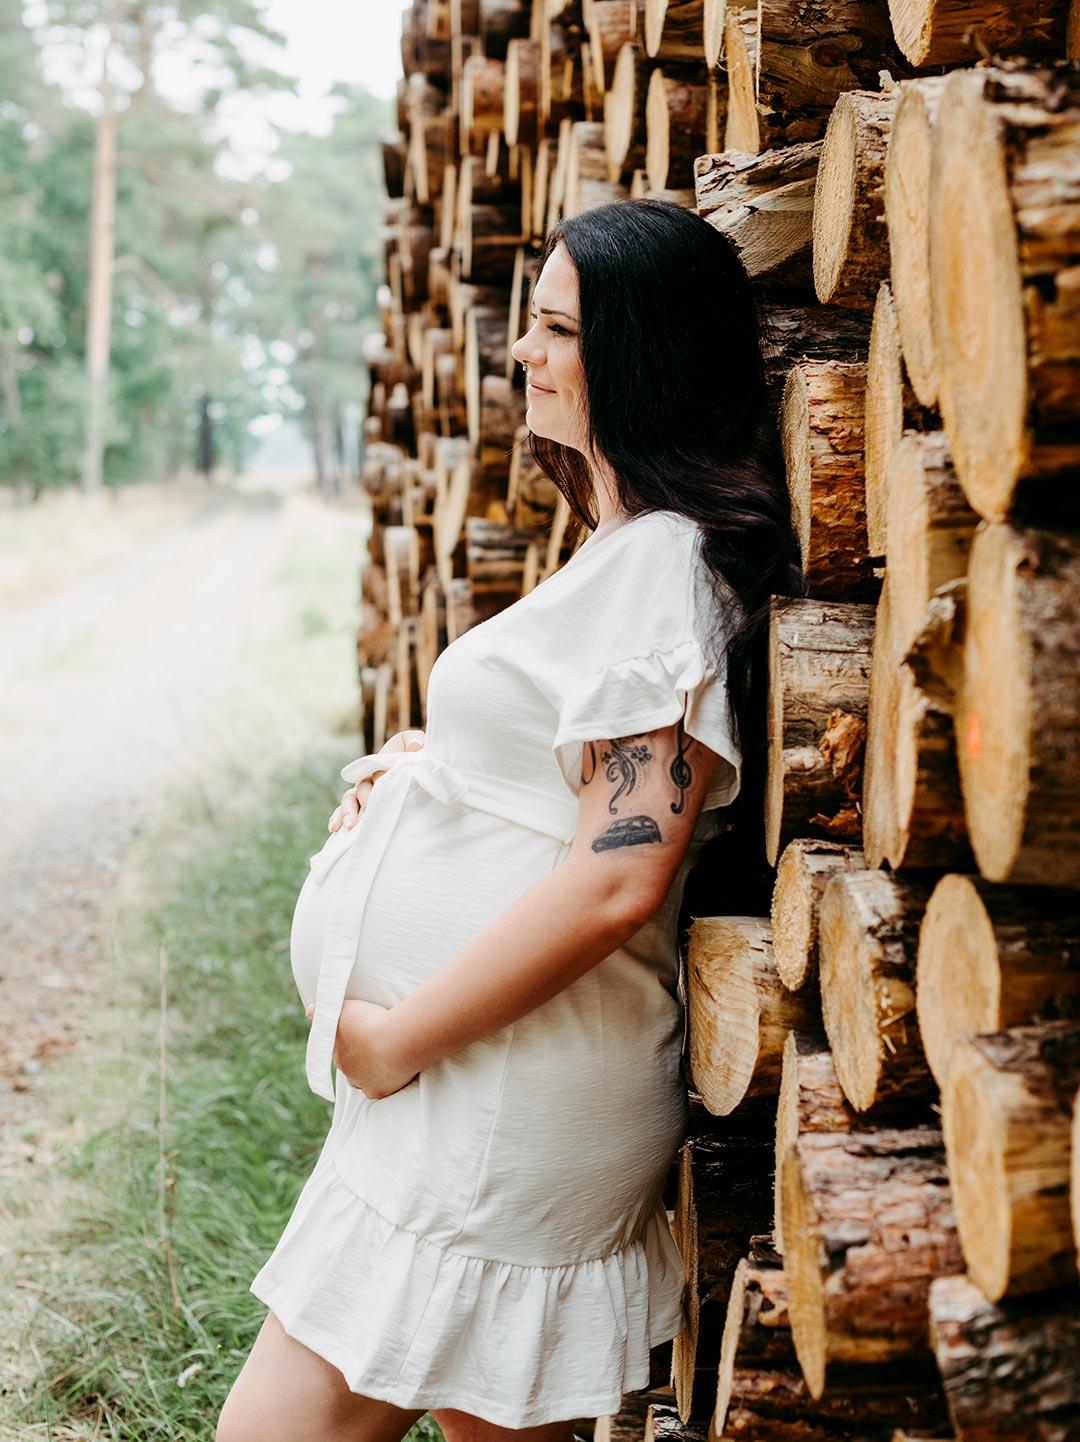 Fotografie Herzberg - 9 months